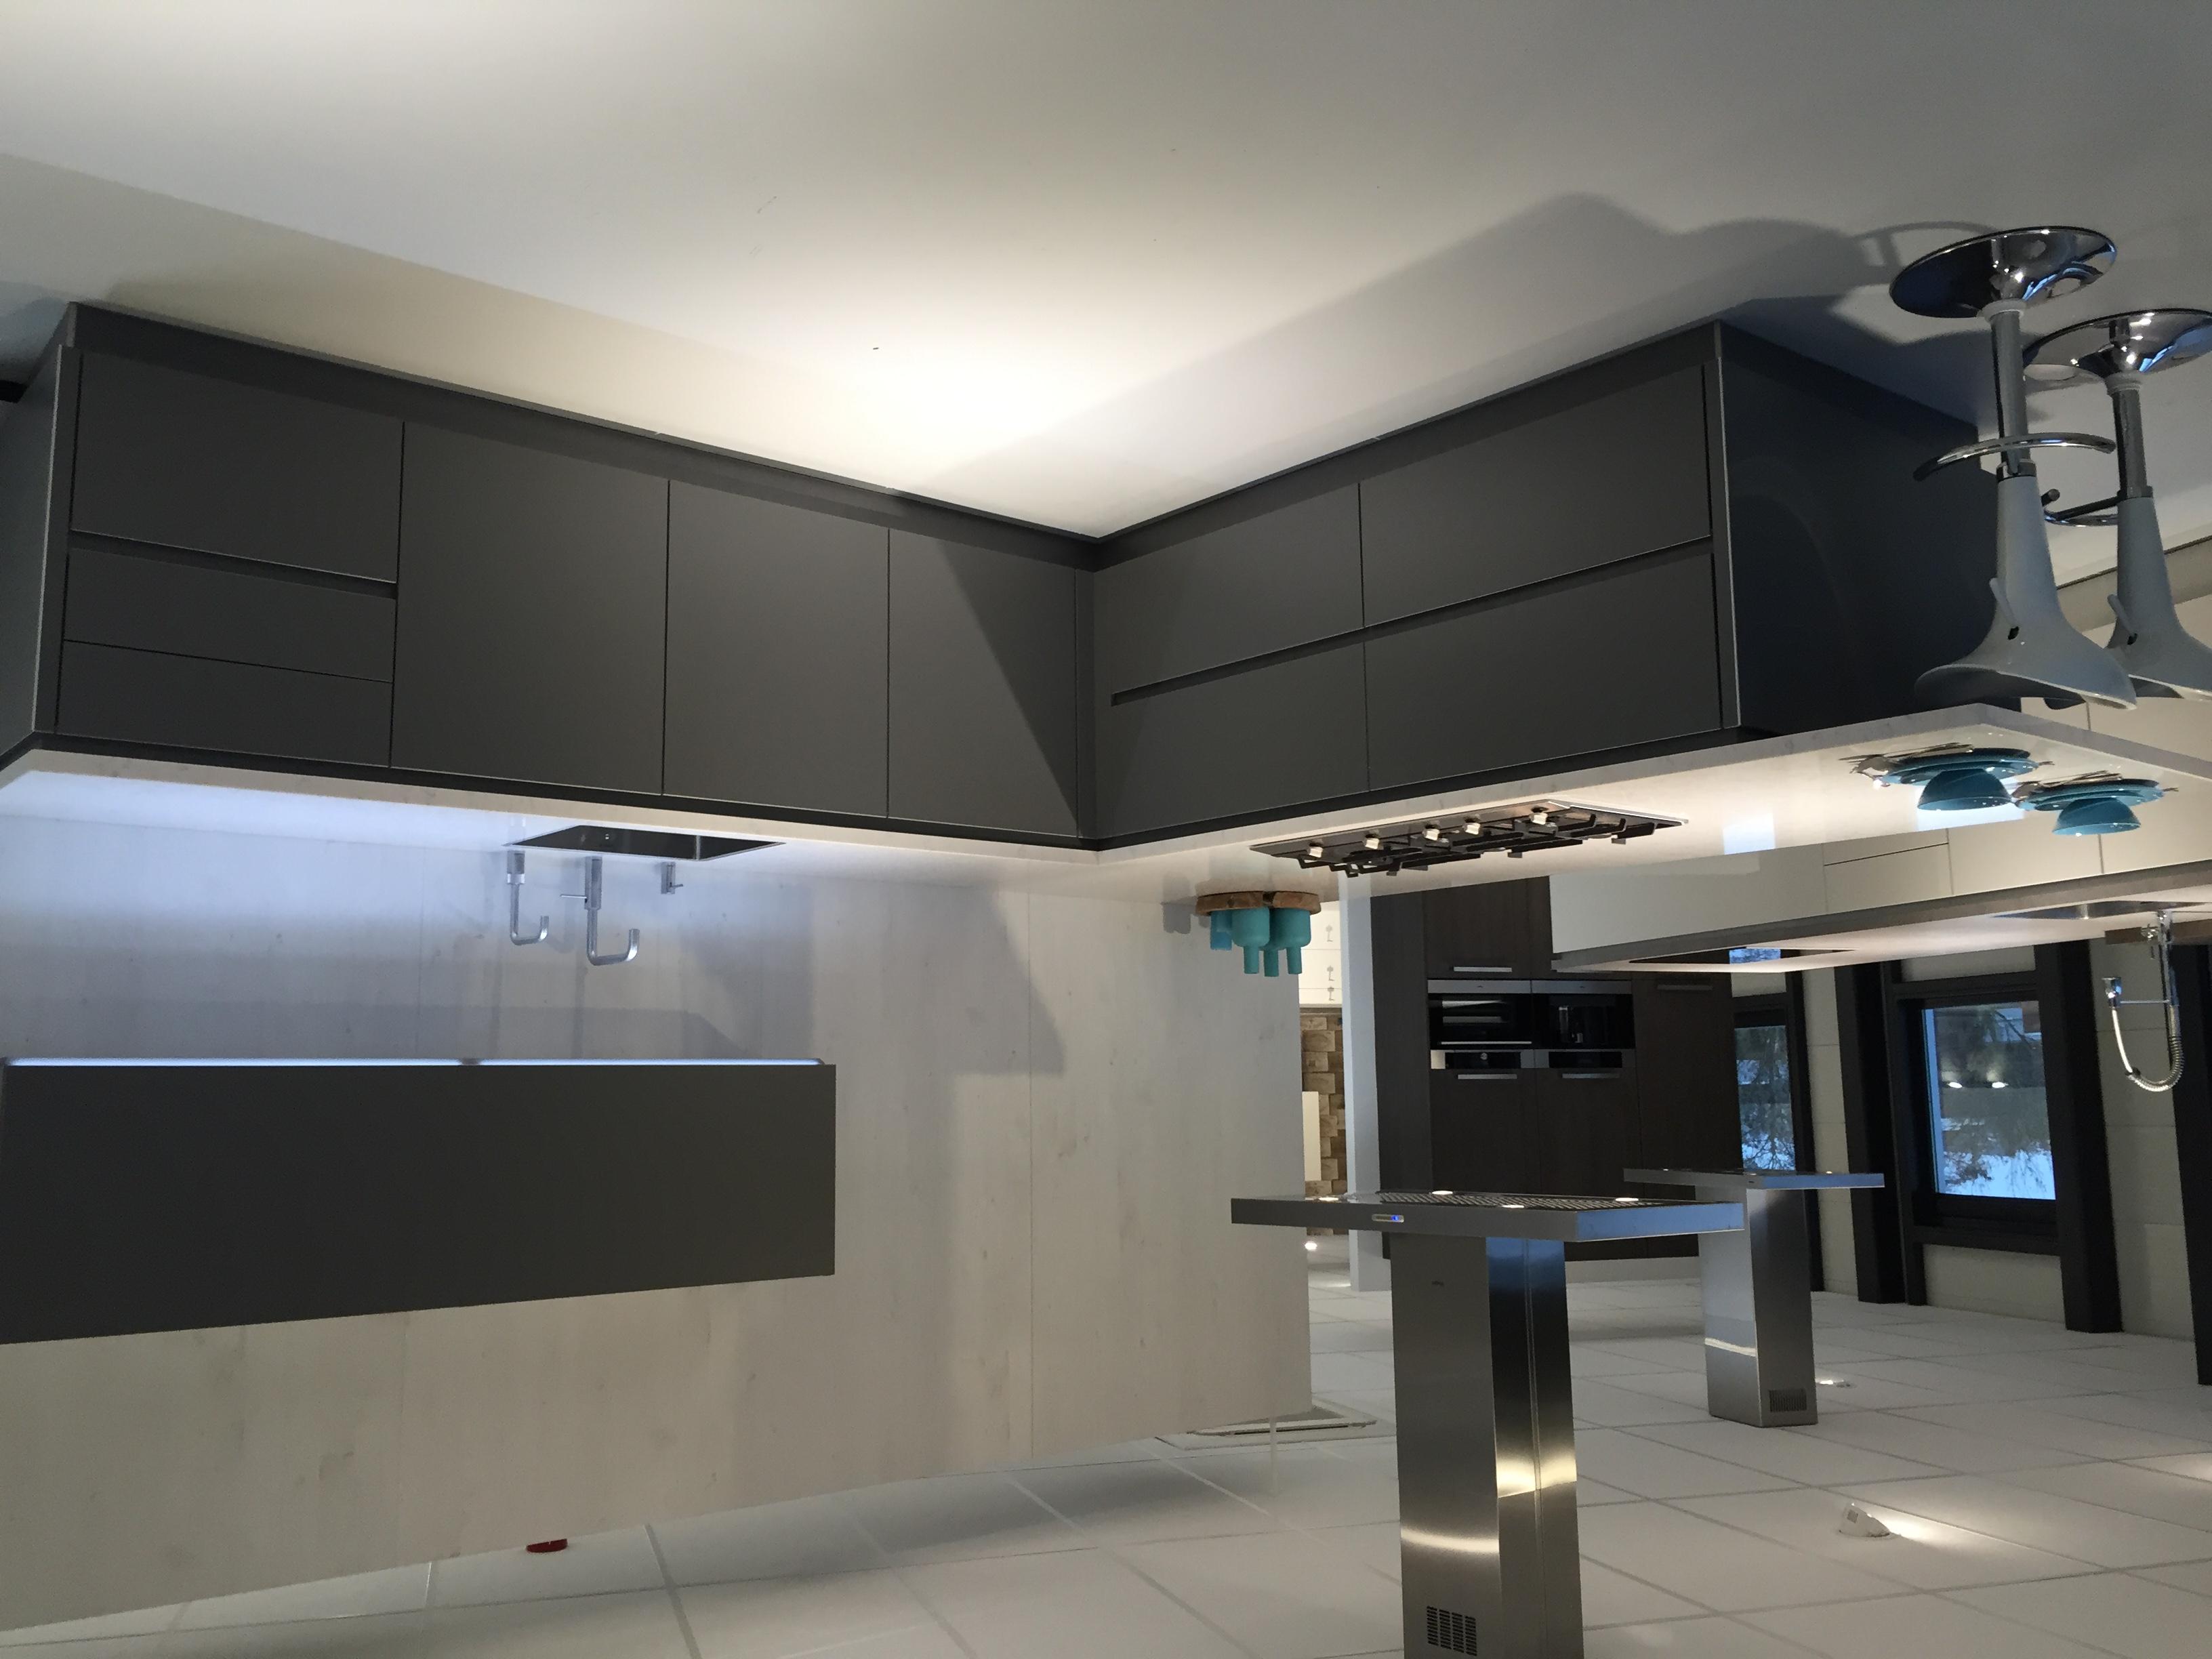 Boretti Keuken Dealers : Kookwereld Goes in GOES Startpagina voor keuken idee?n UW-keuken.nl